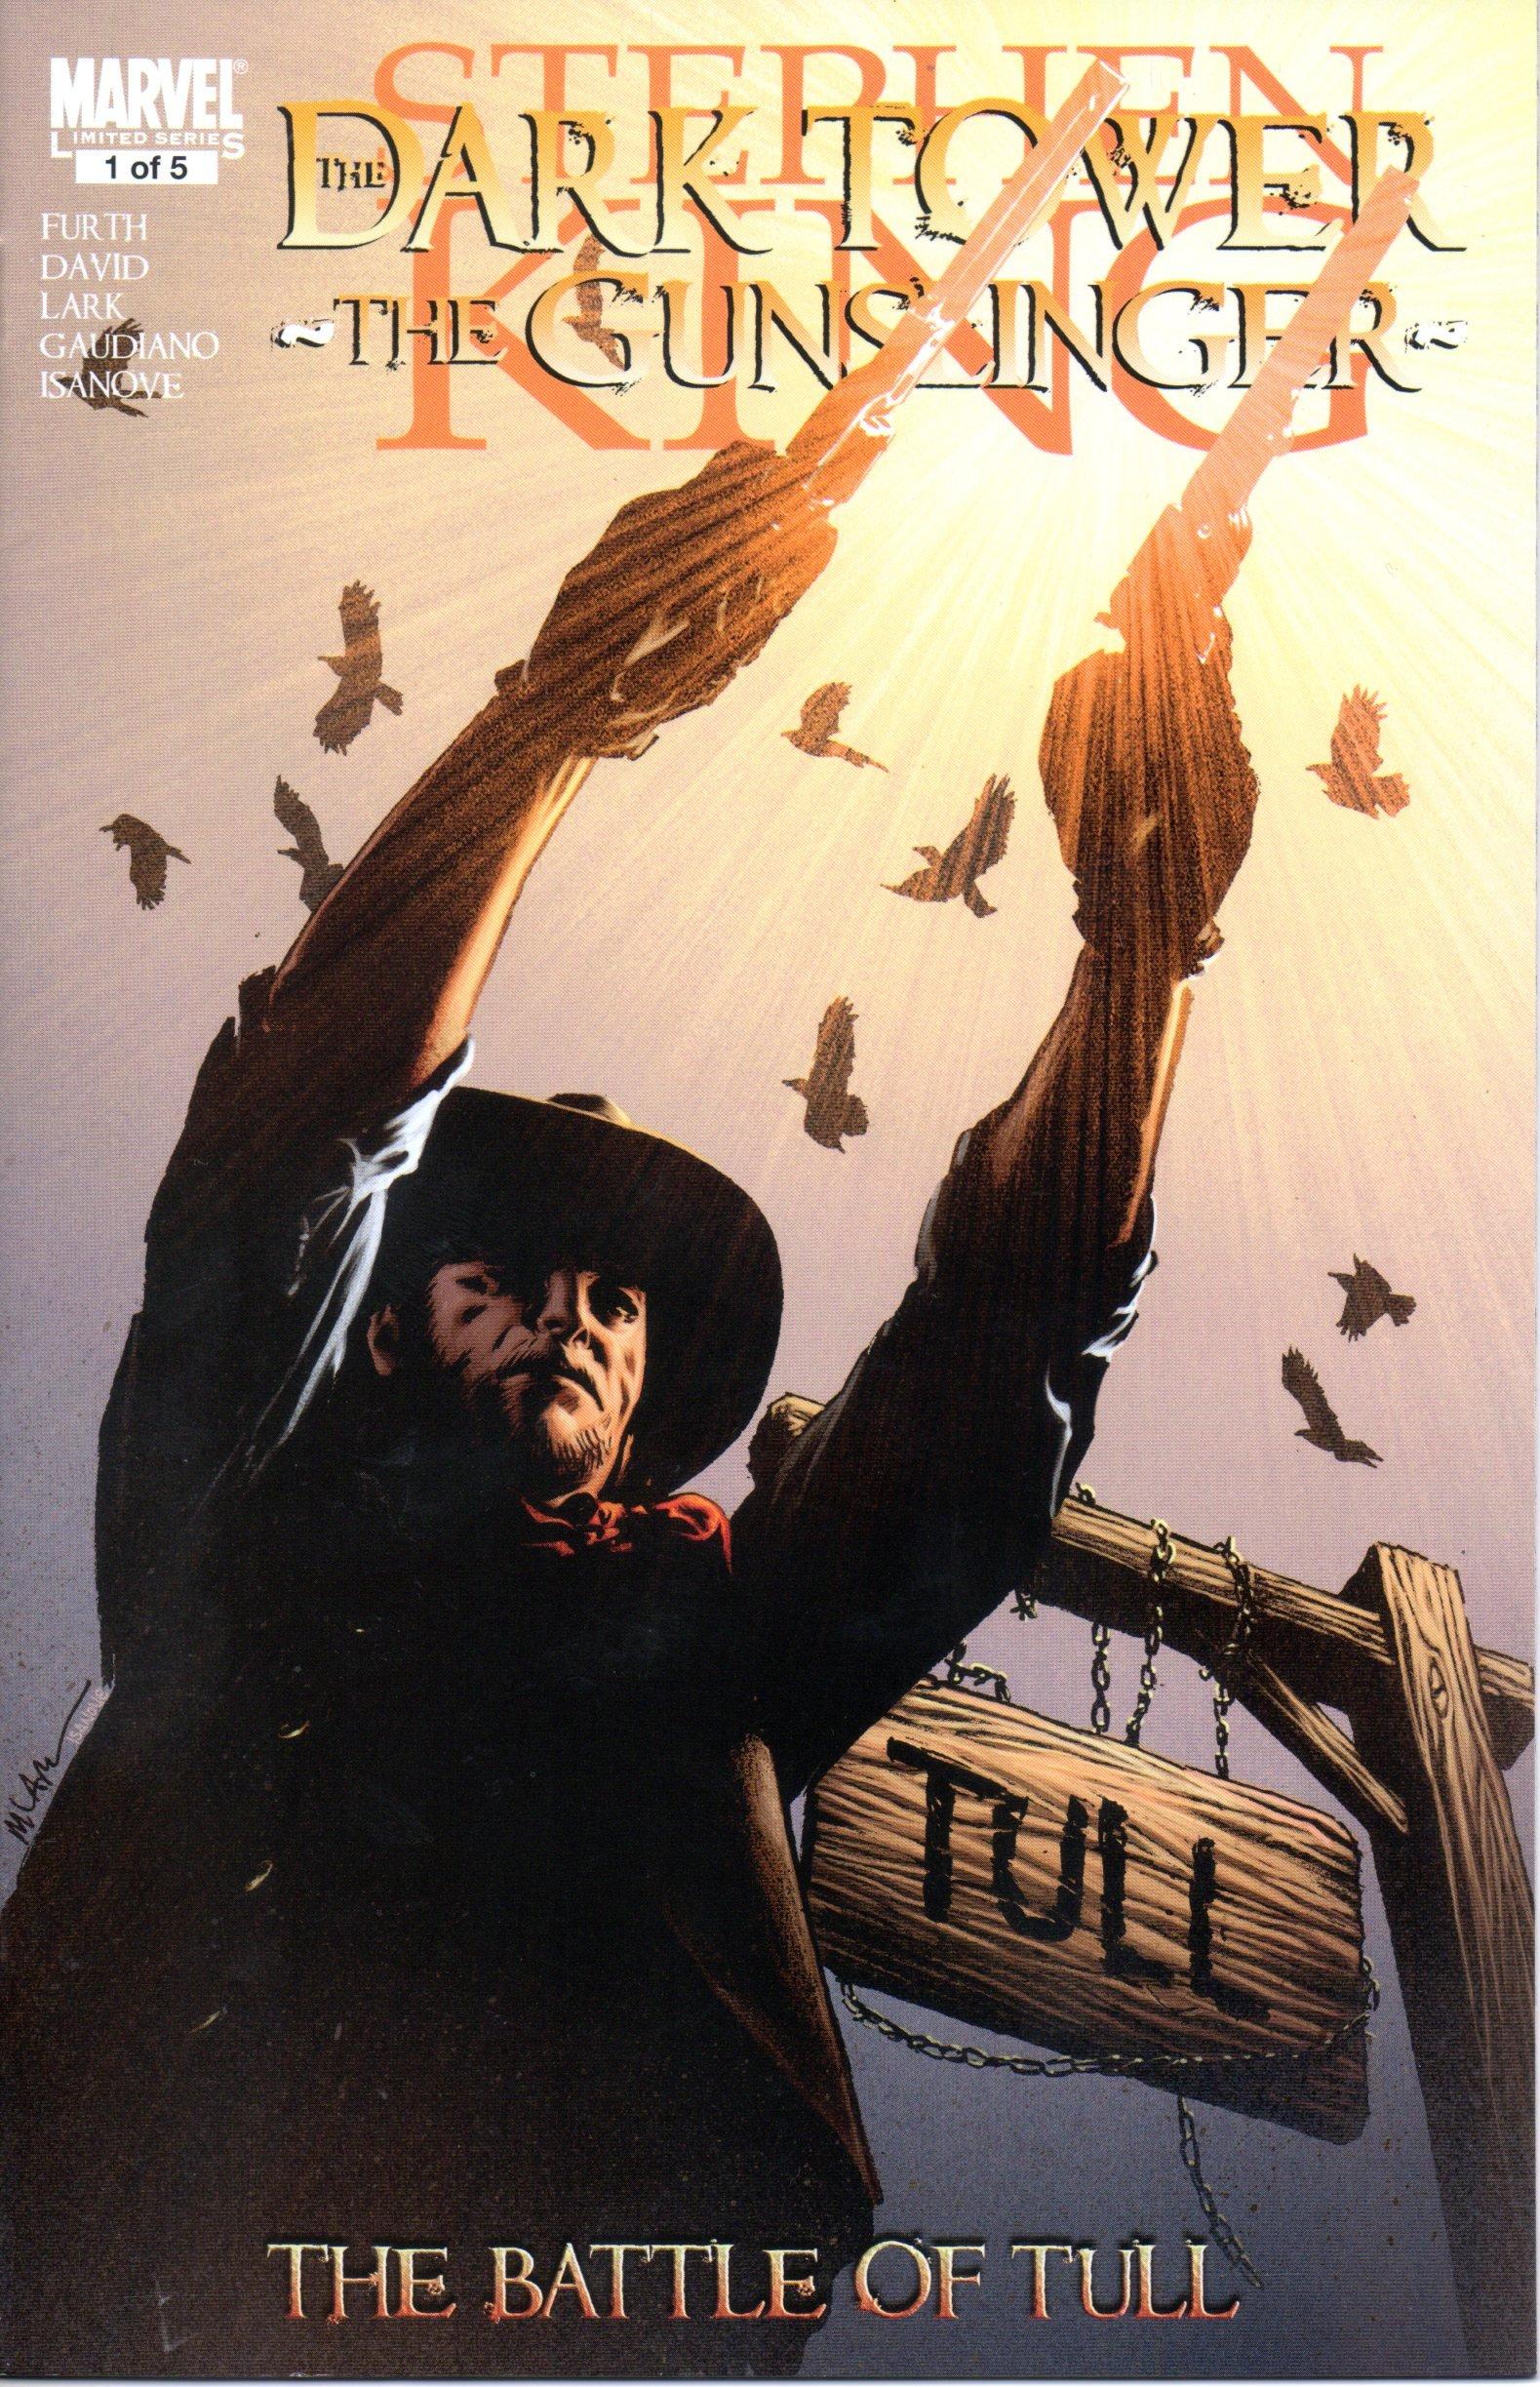 Download Dark Tower - The Gunslinger - The Battle Of Tull #1 - Complete Mini Series PDF